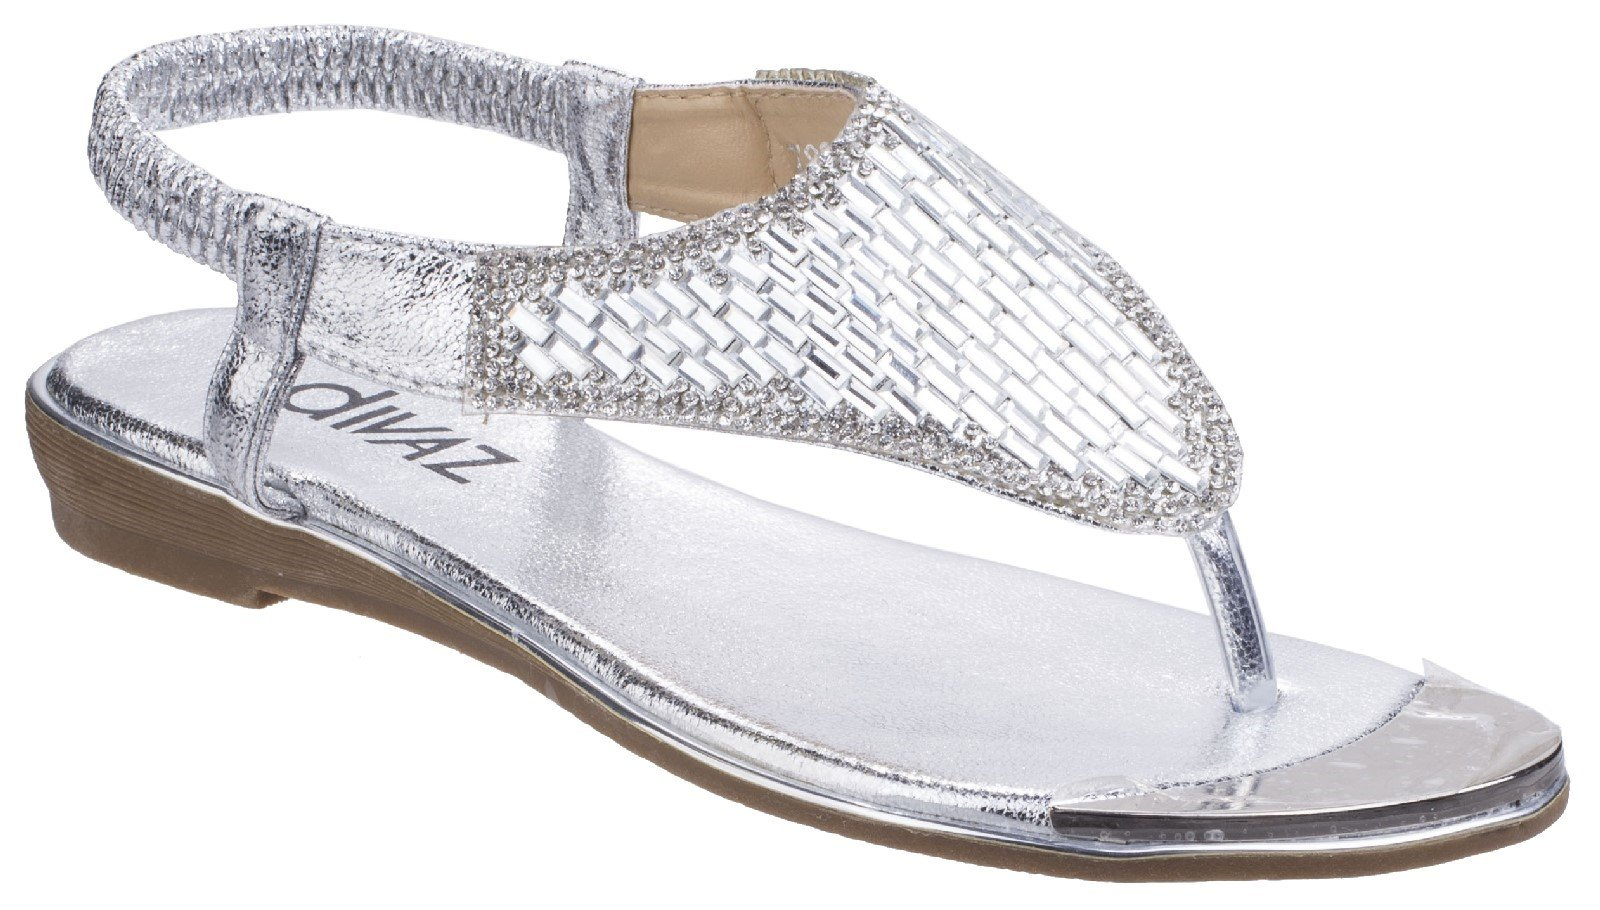 Divaz Women's Kirsty Toe Post Sandal Various Colours 26331 - Silver 3